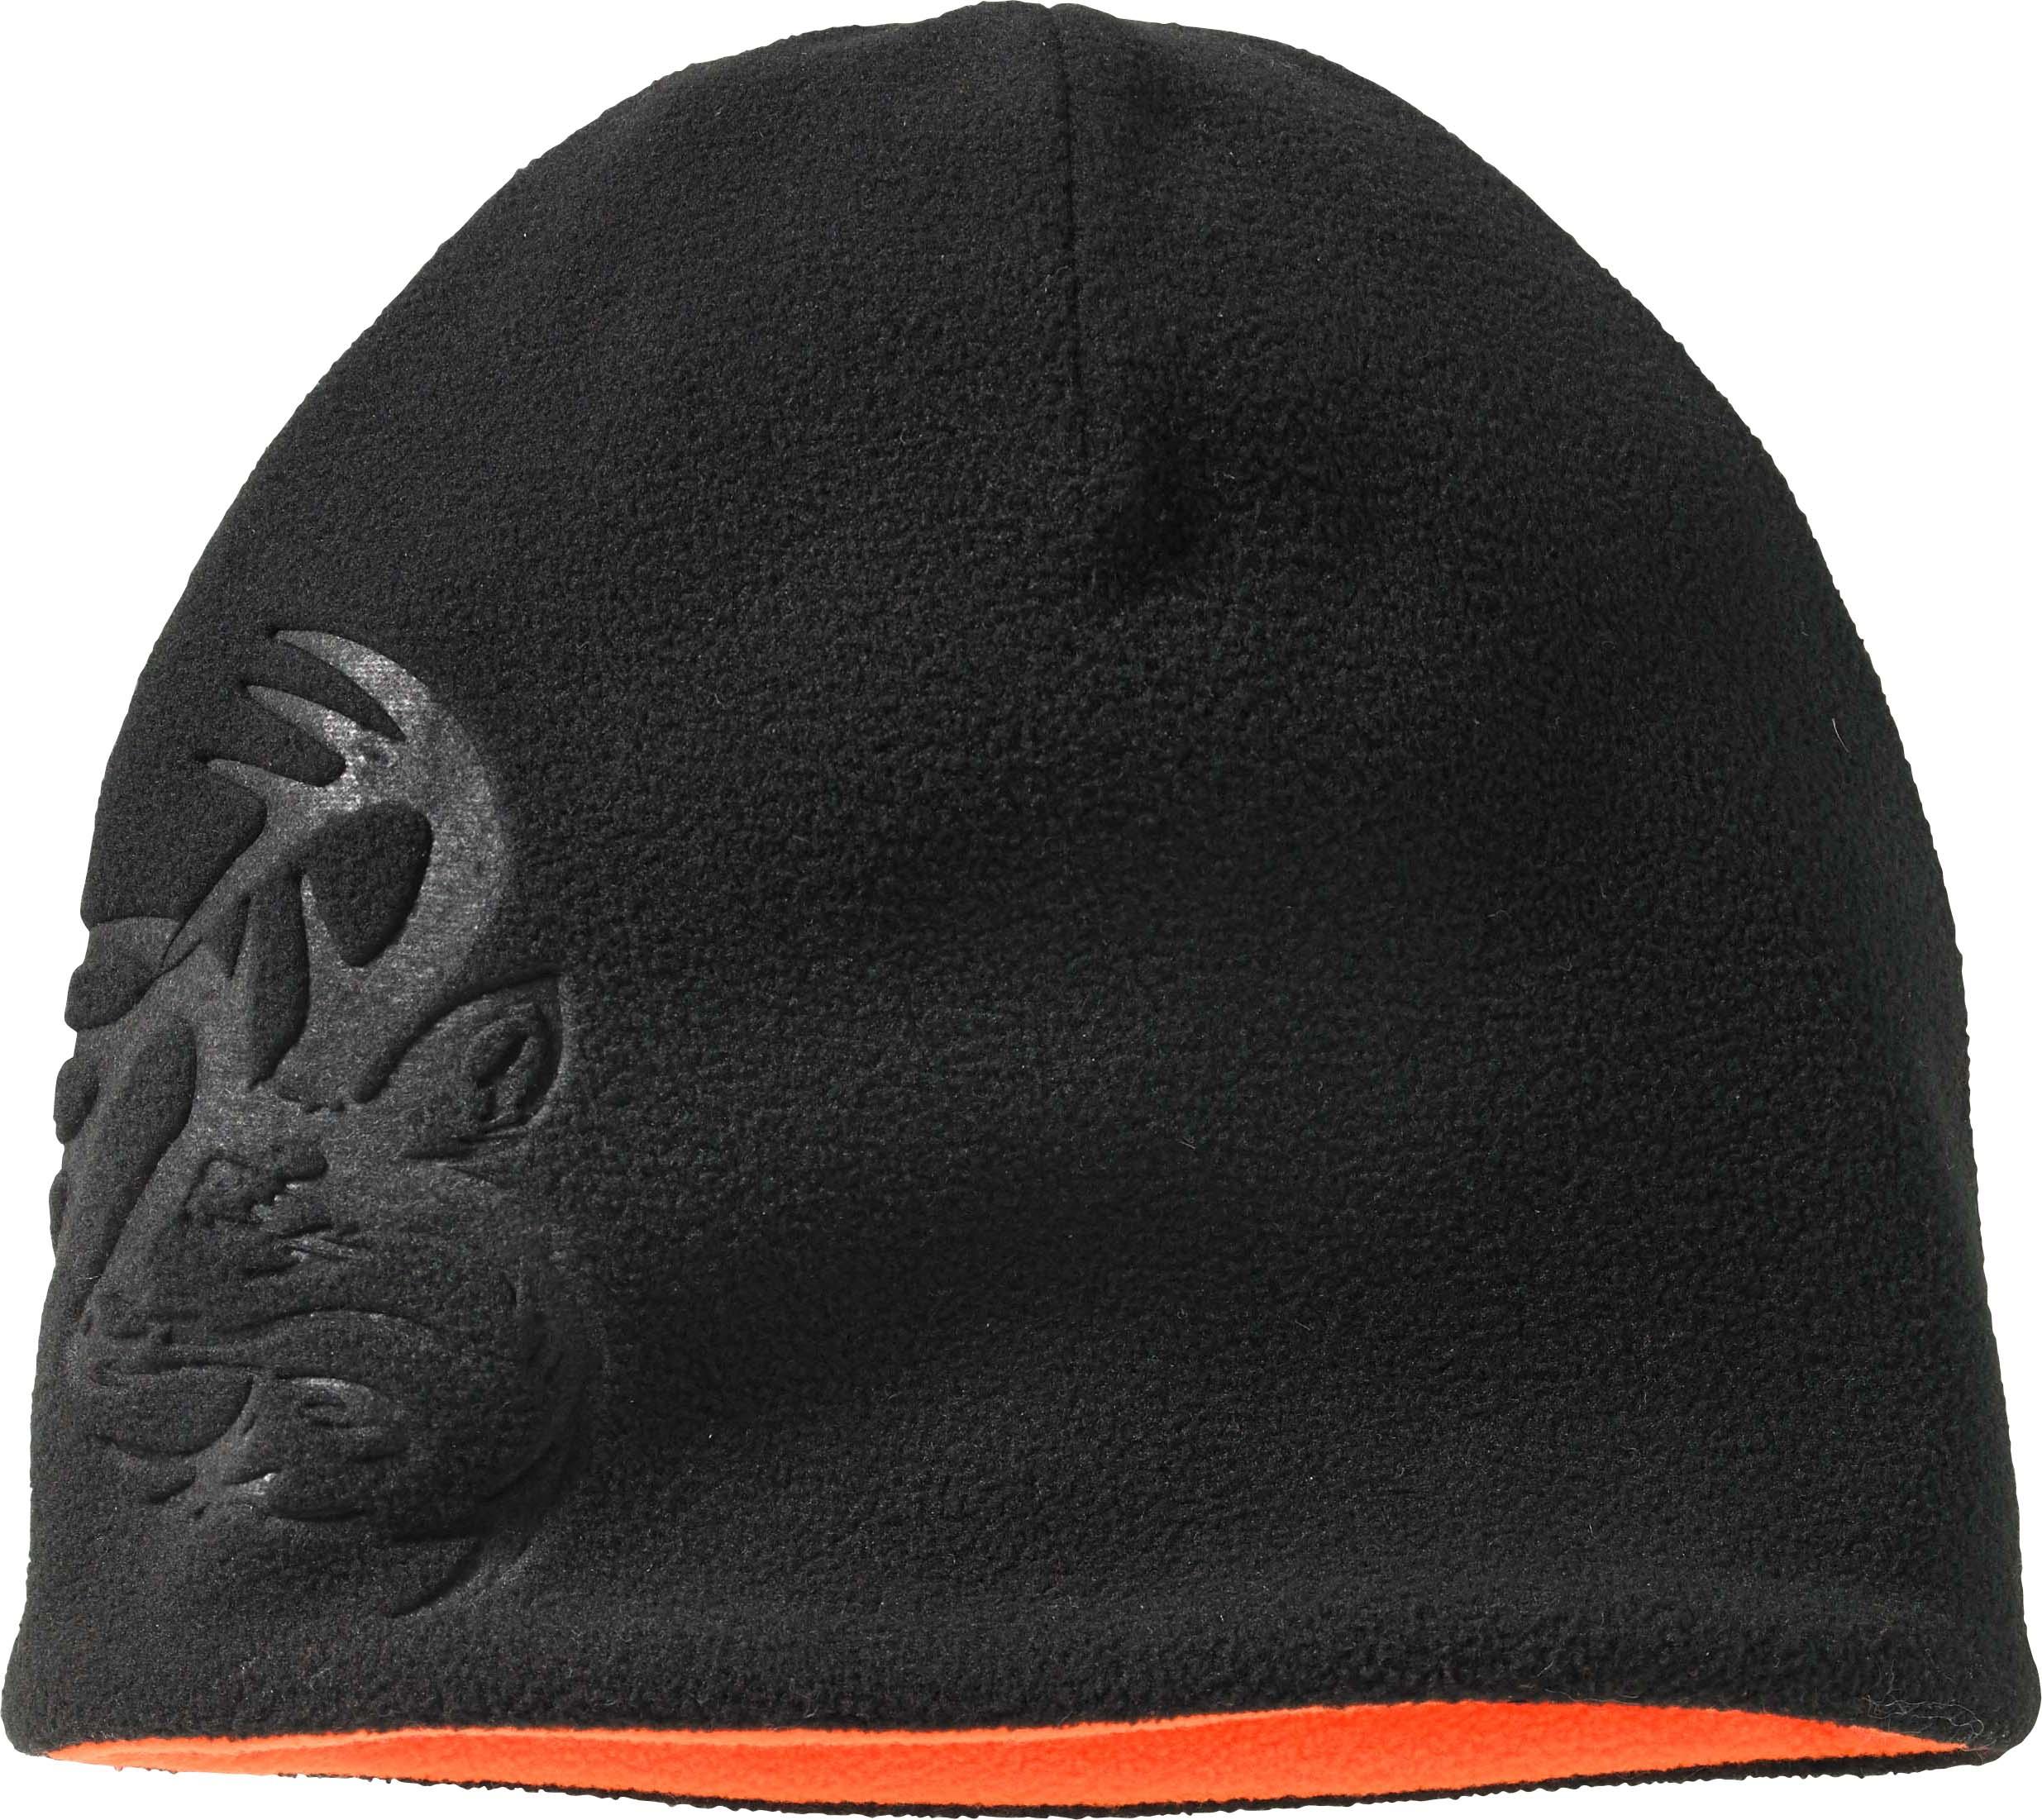 c33b74f94f1 ... Winter Hat · Men s First Light Fleece Reversible Winter ...